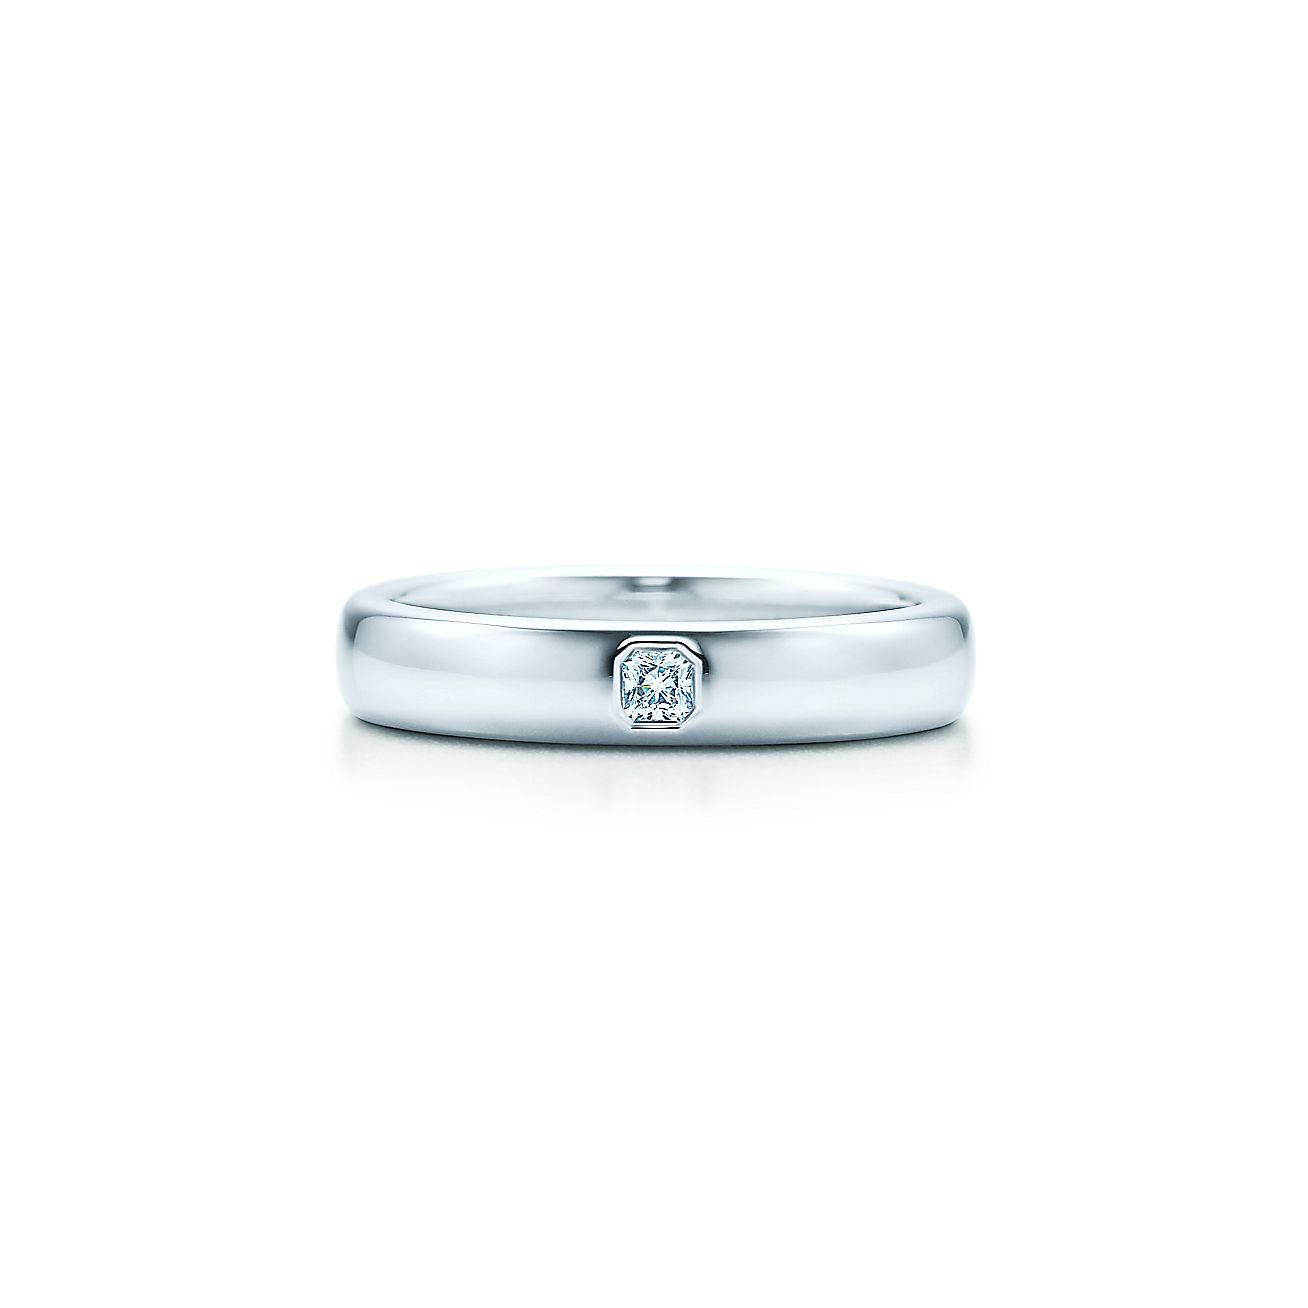 LucidaR Band Ring Bezel Set Diamond Platinum